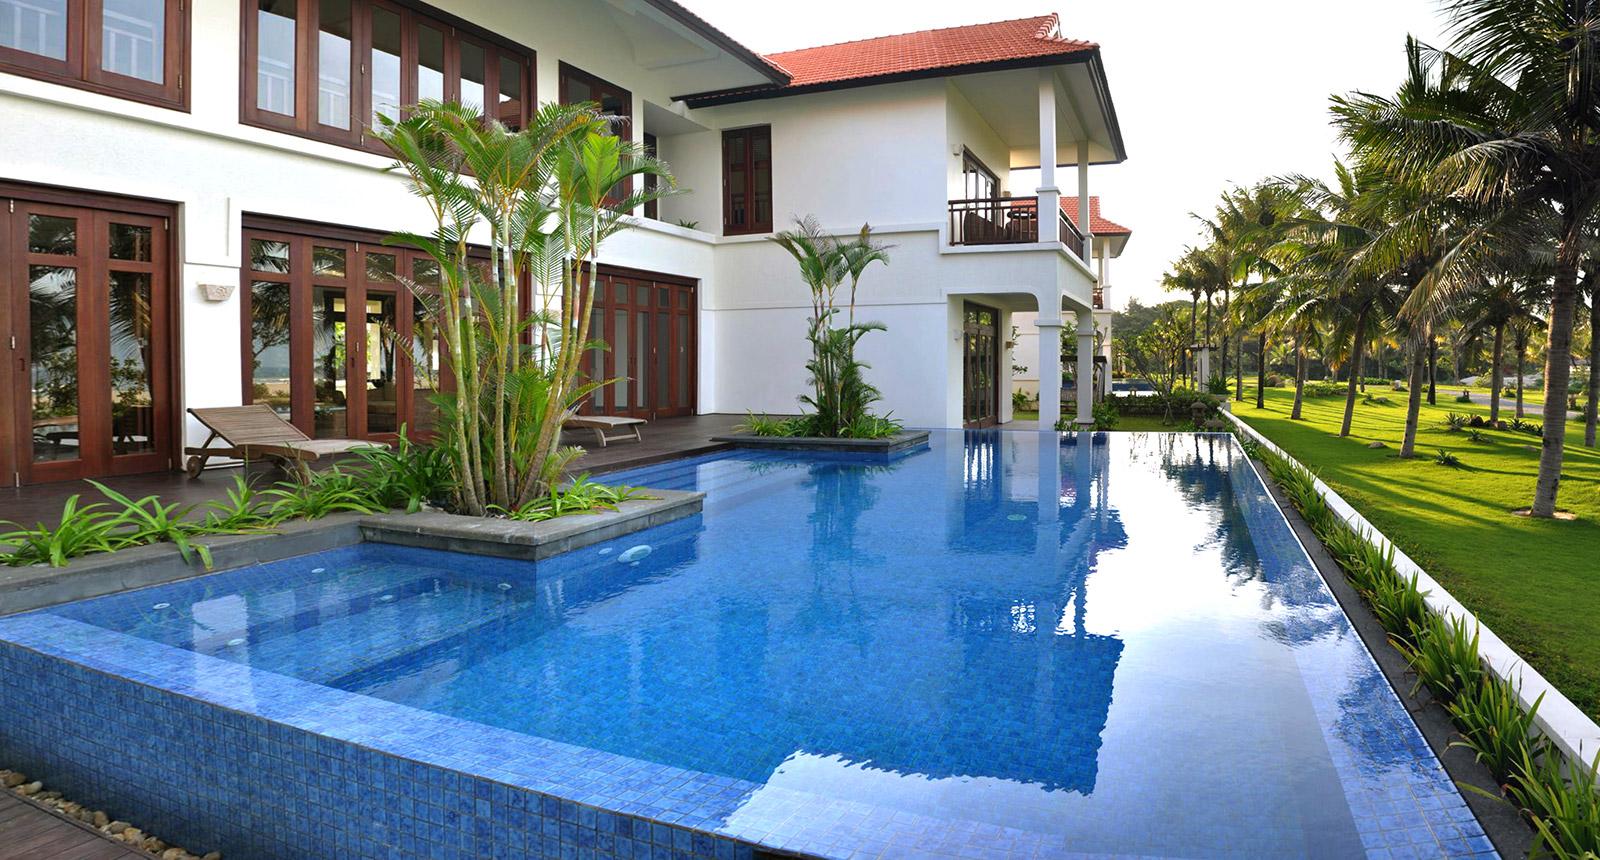 The swimming pool at the villa of Furama Resort